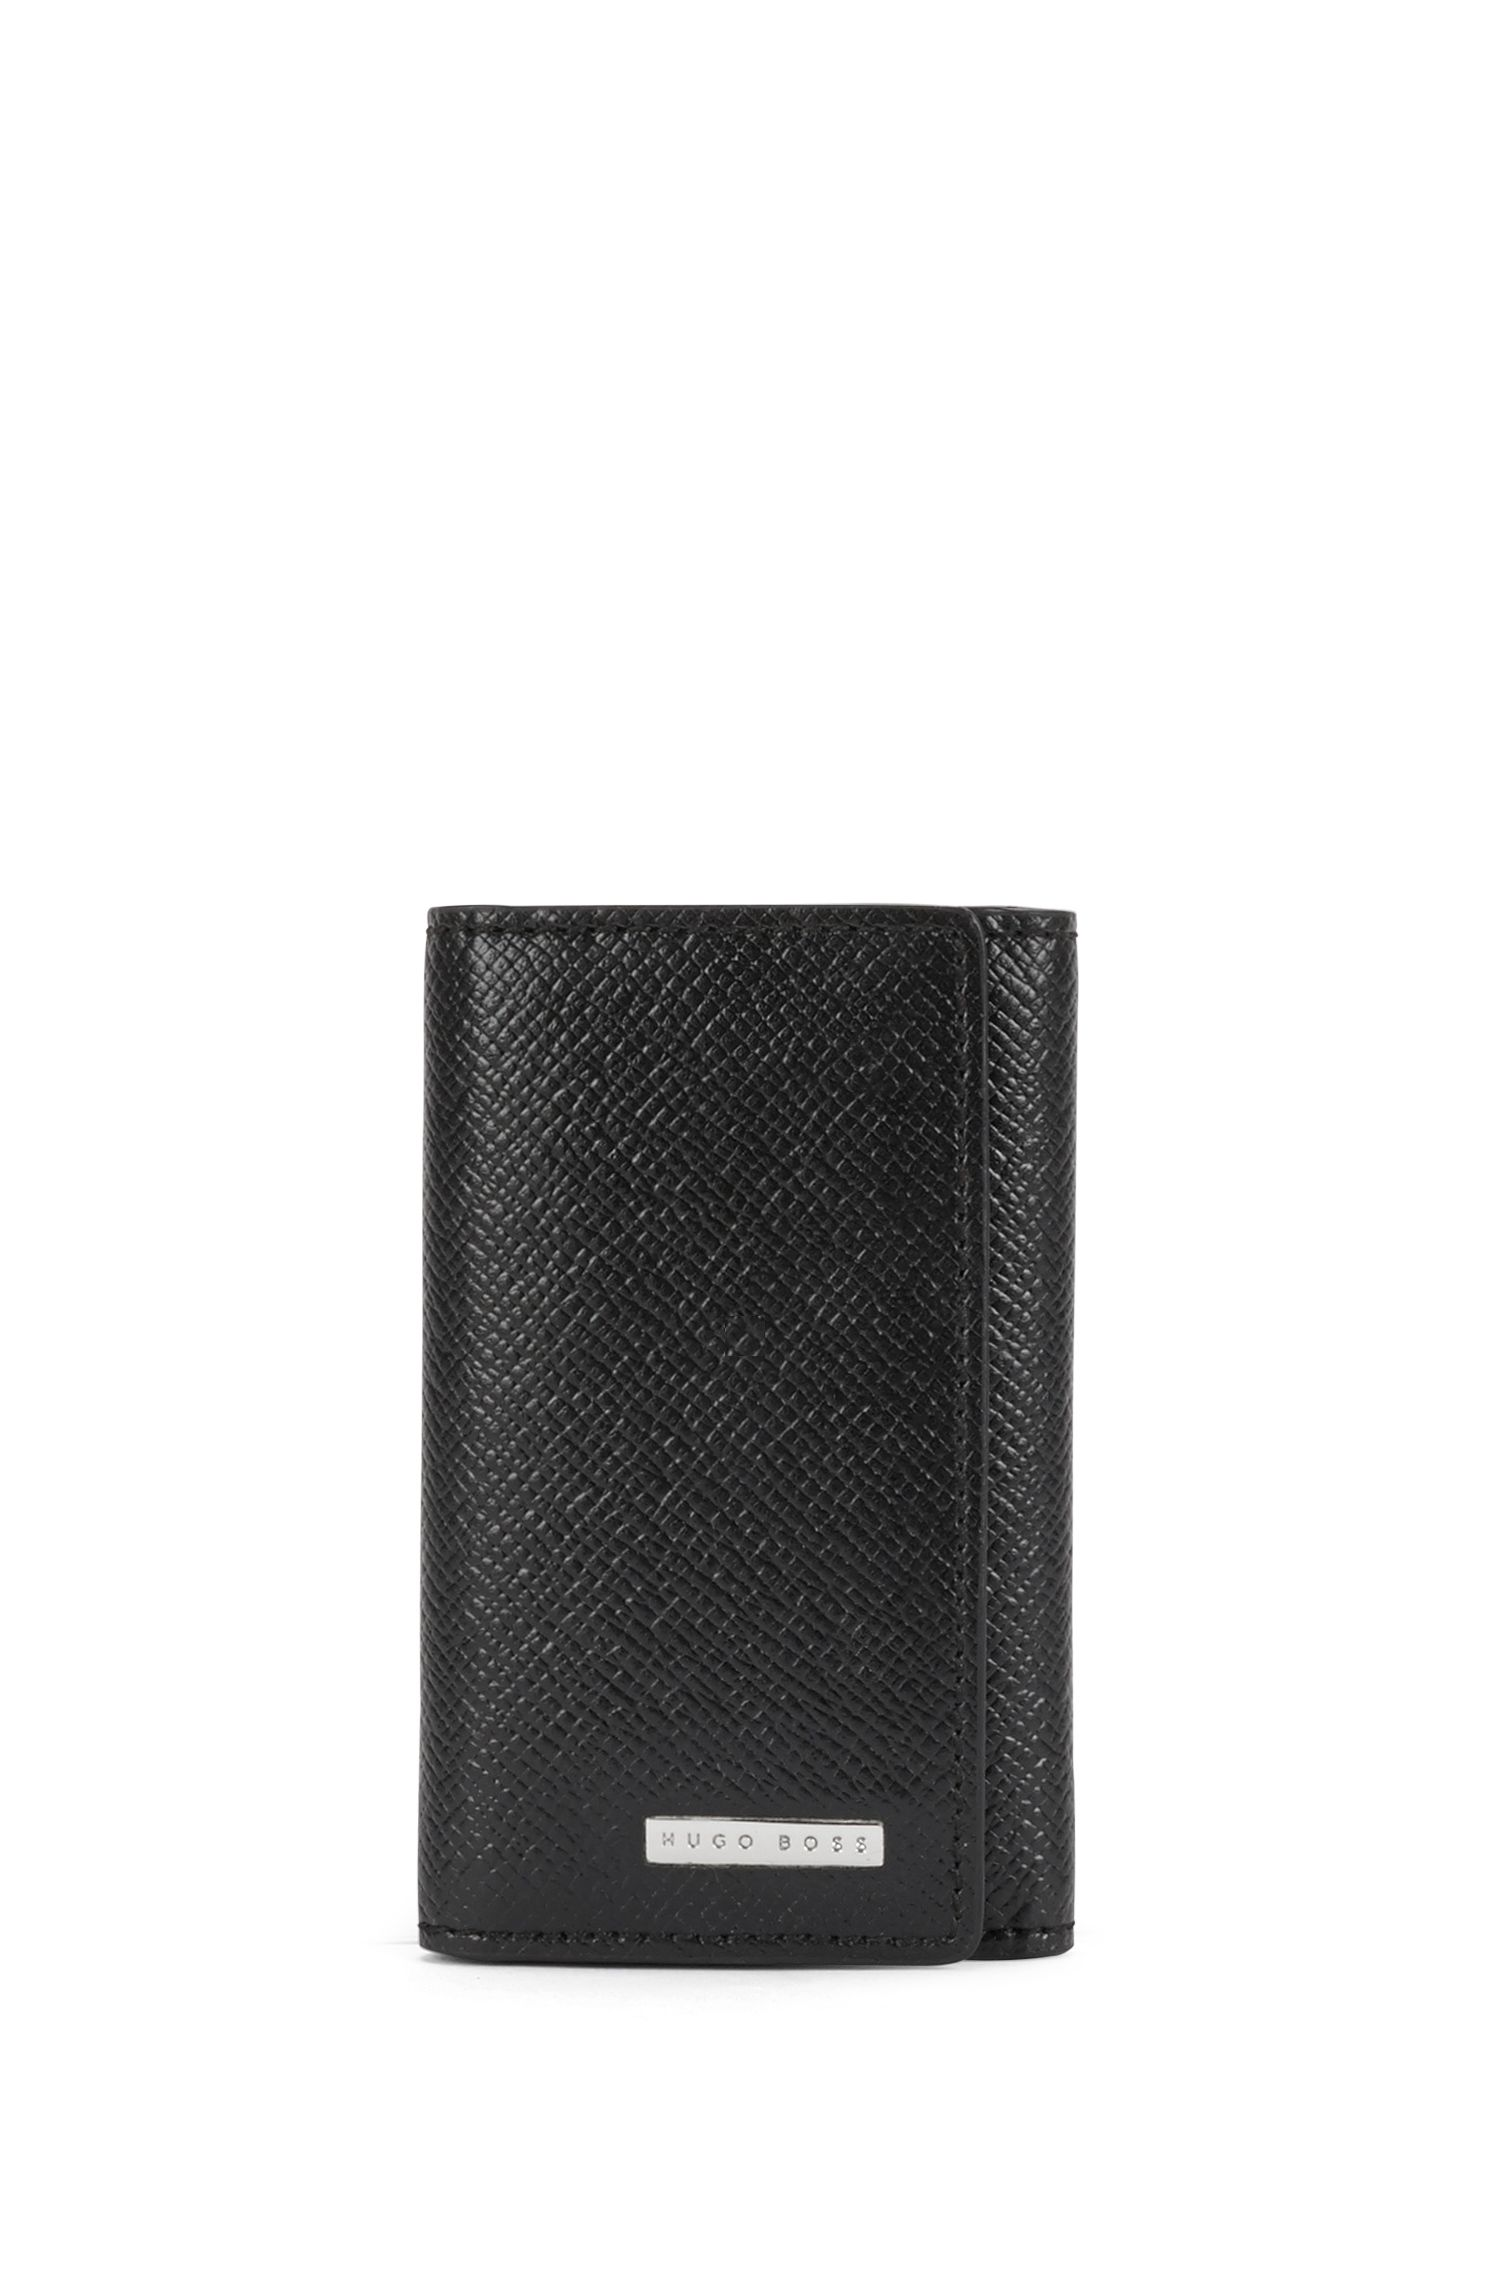 Signature Collection key case in palmellato leather